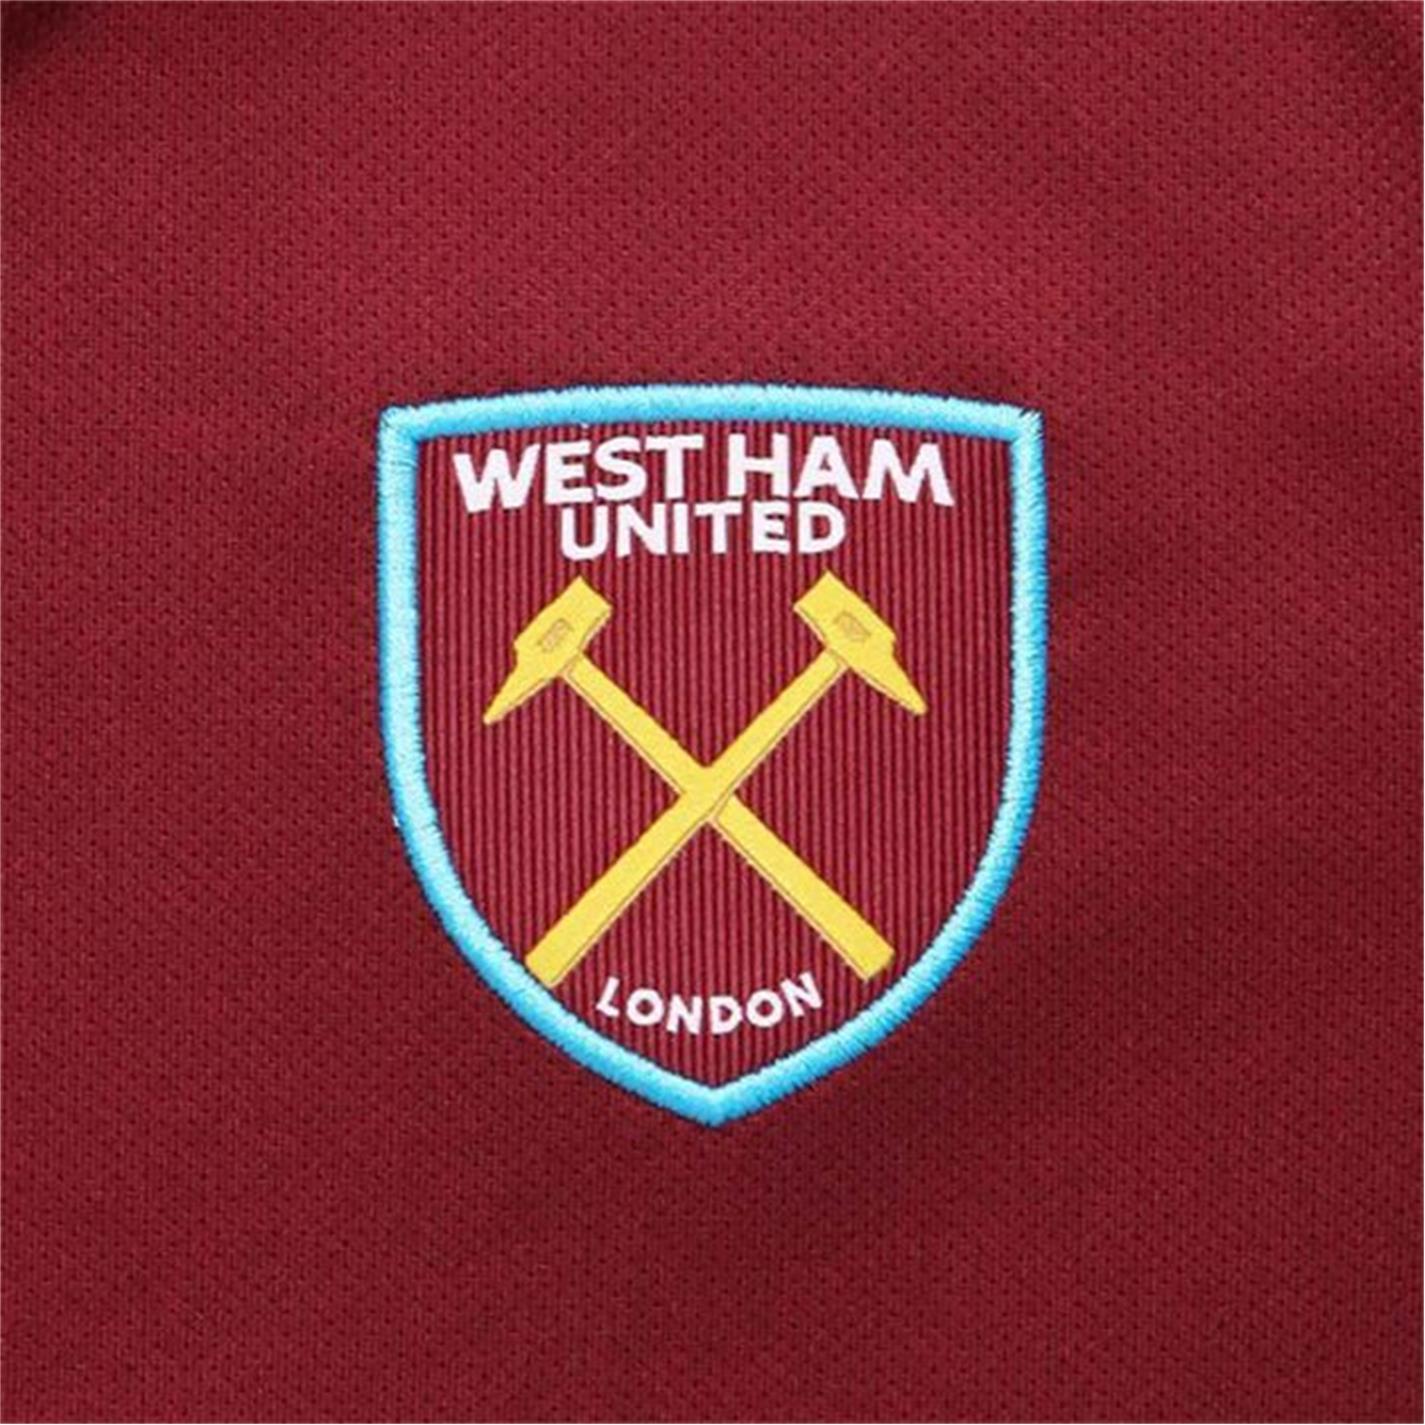 Costumase bebelusi cu echipe fotbal Umbro West Ham United 2021 2022 visiniu albastru